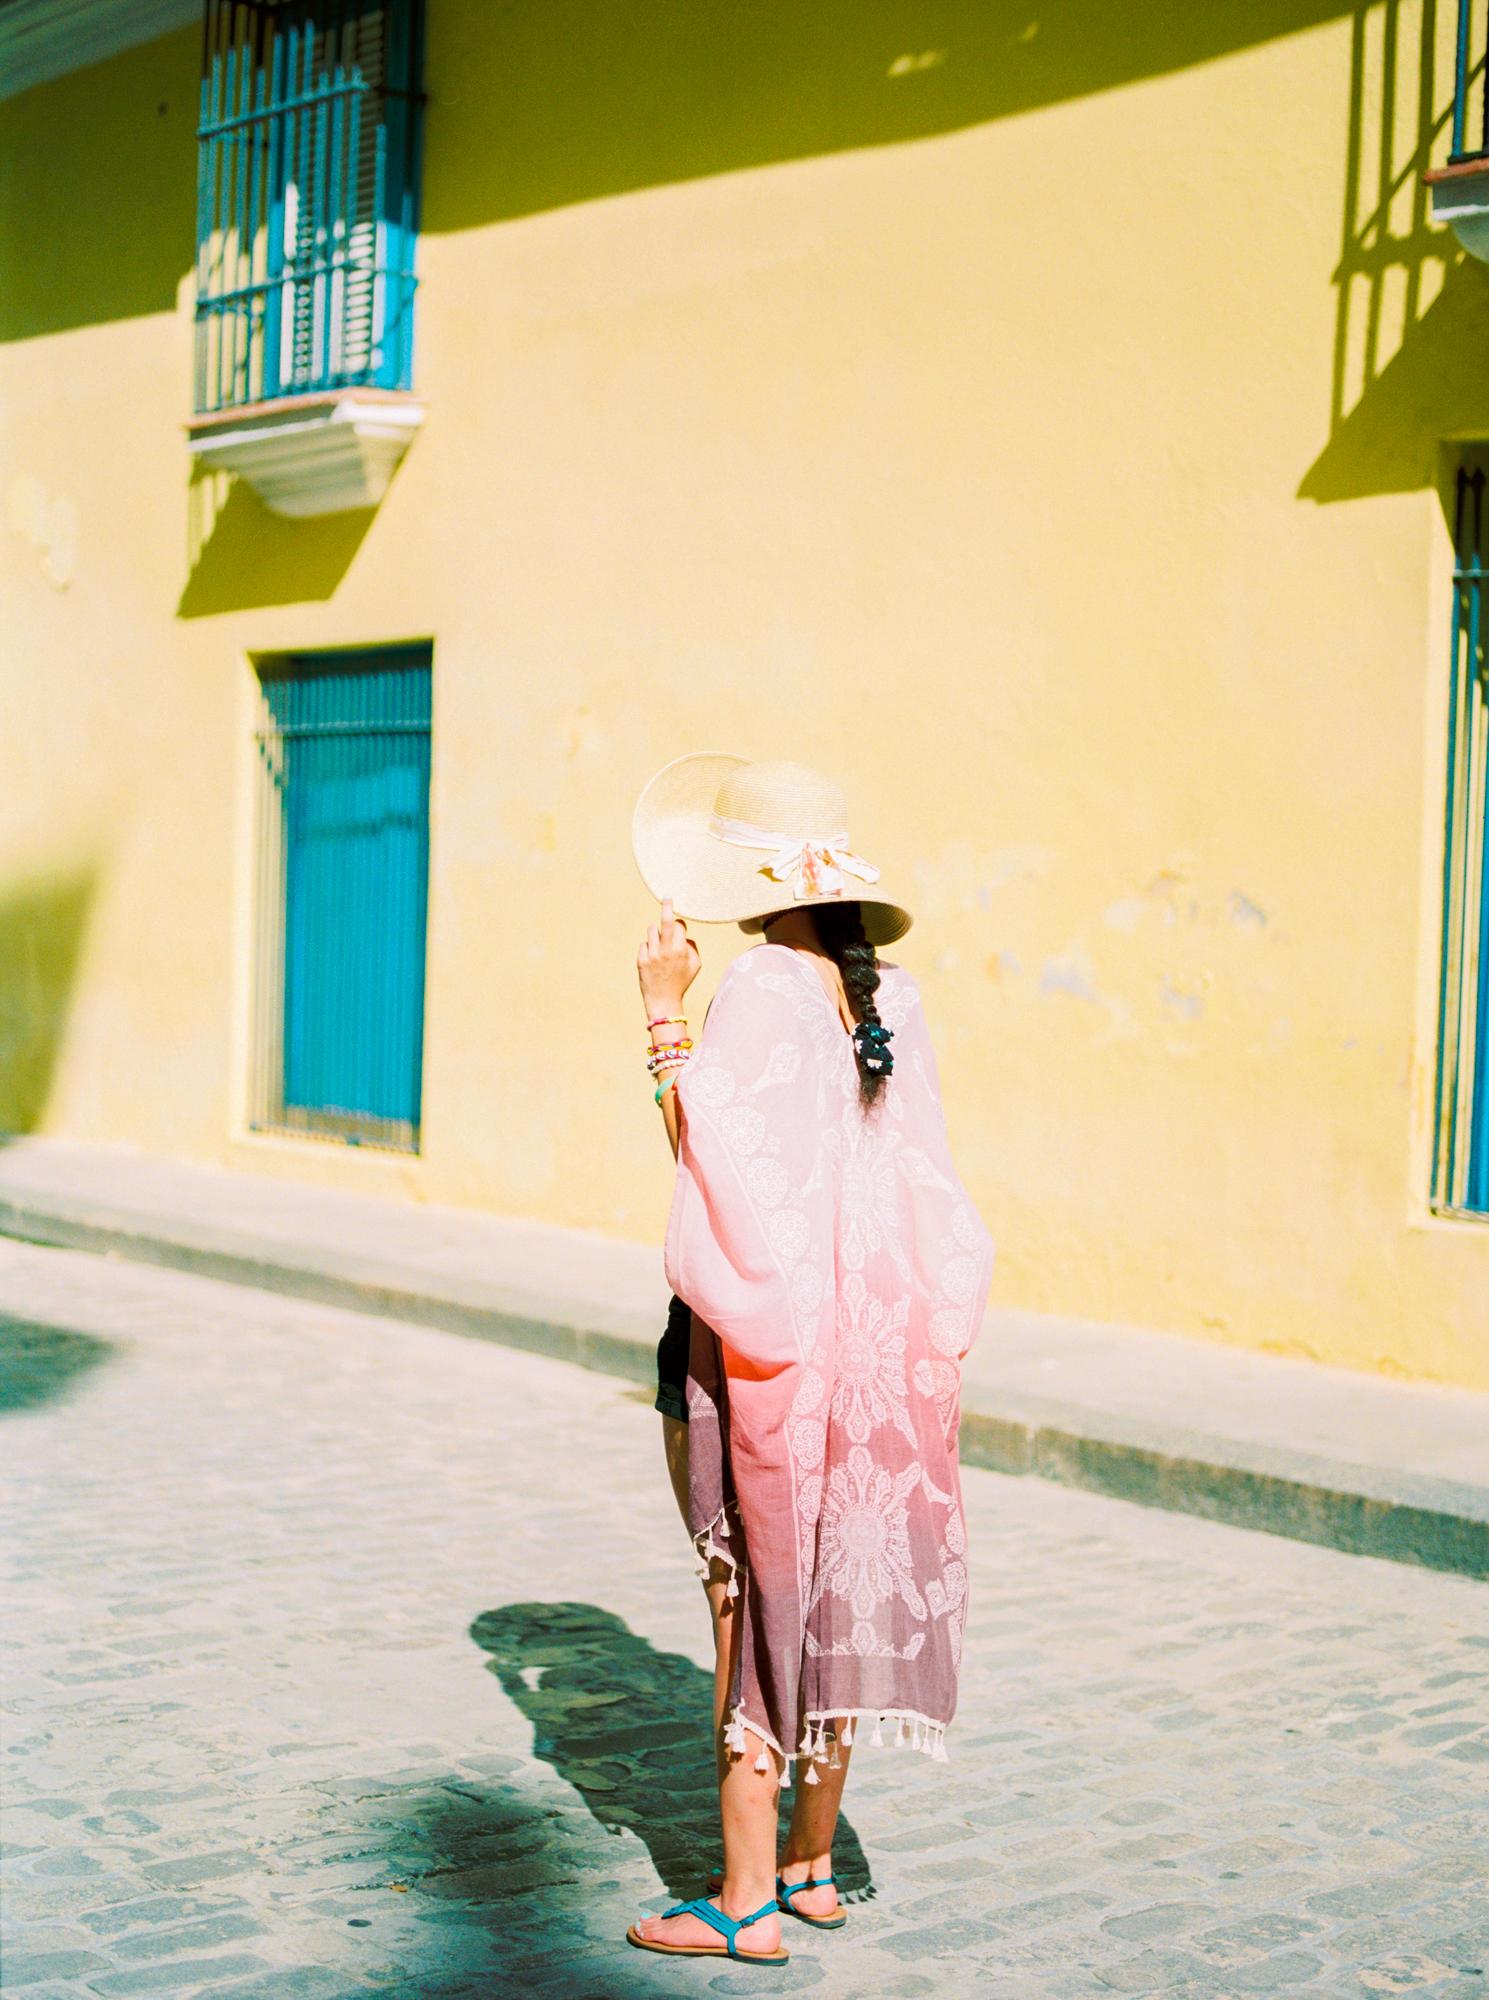 Erika Alvarenga Photography - Film 2018 - Travelling Photographer-9.jpg